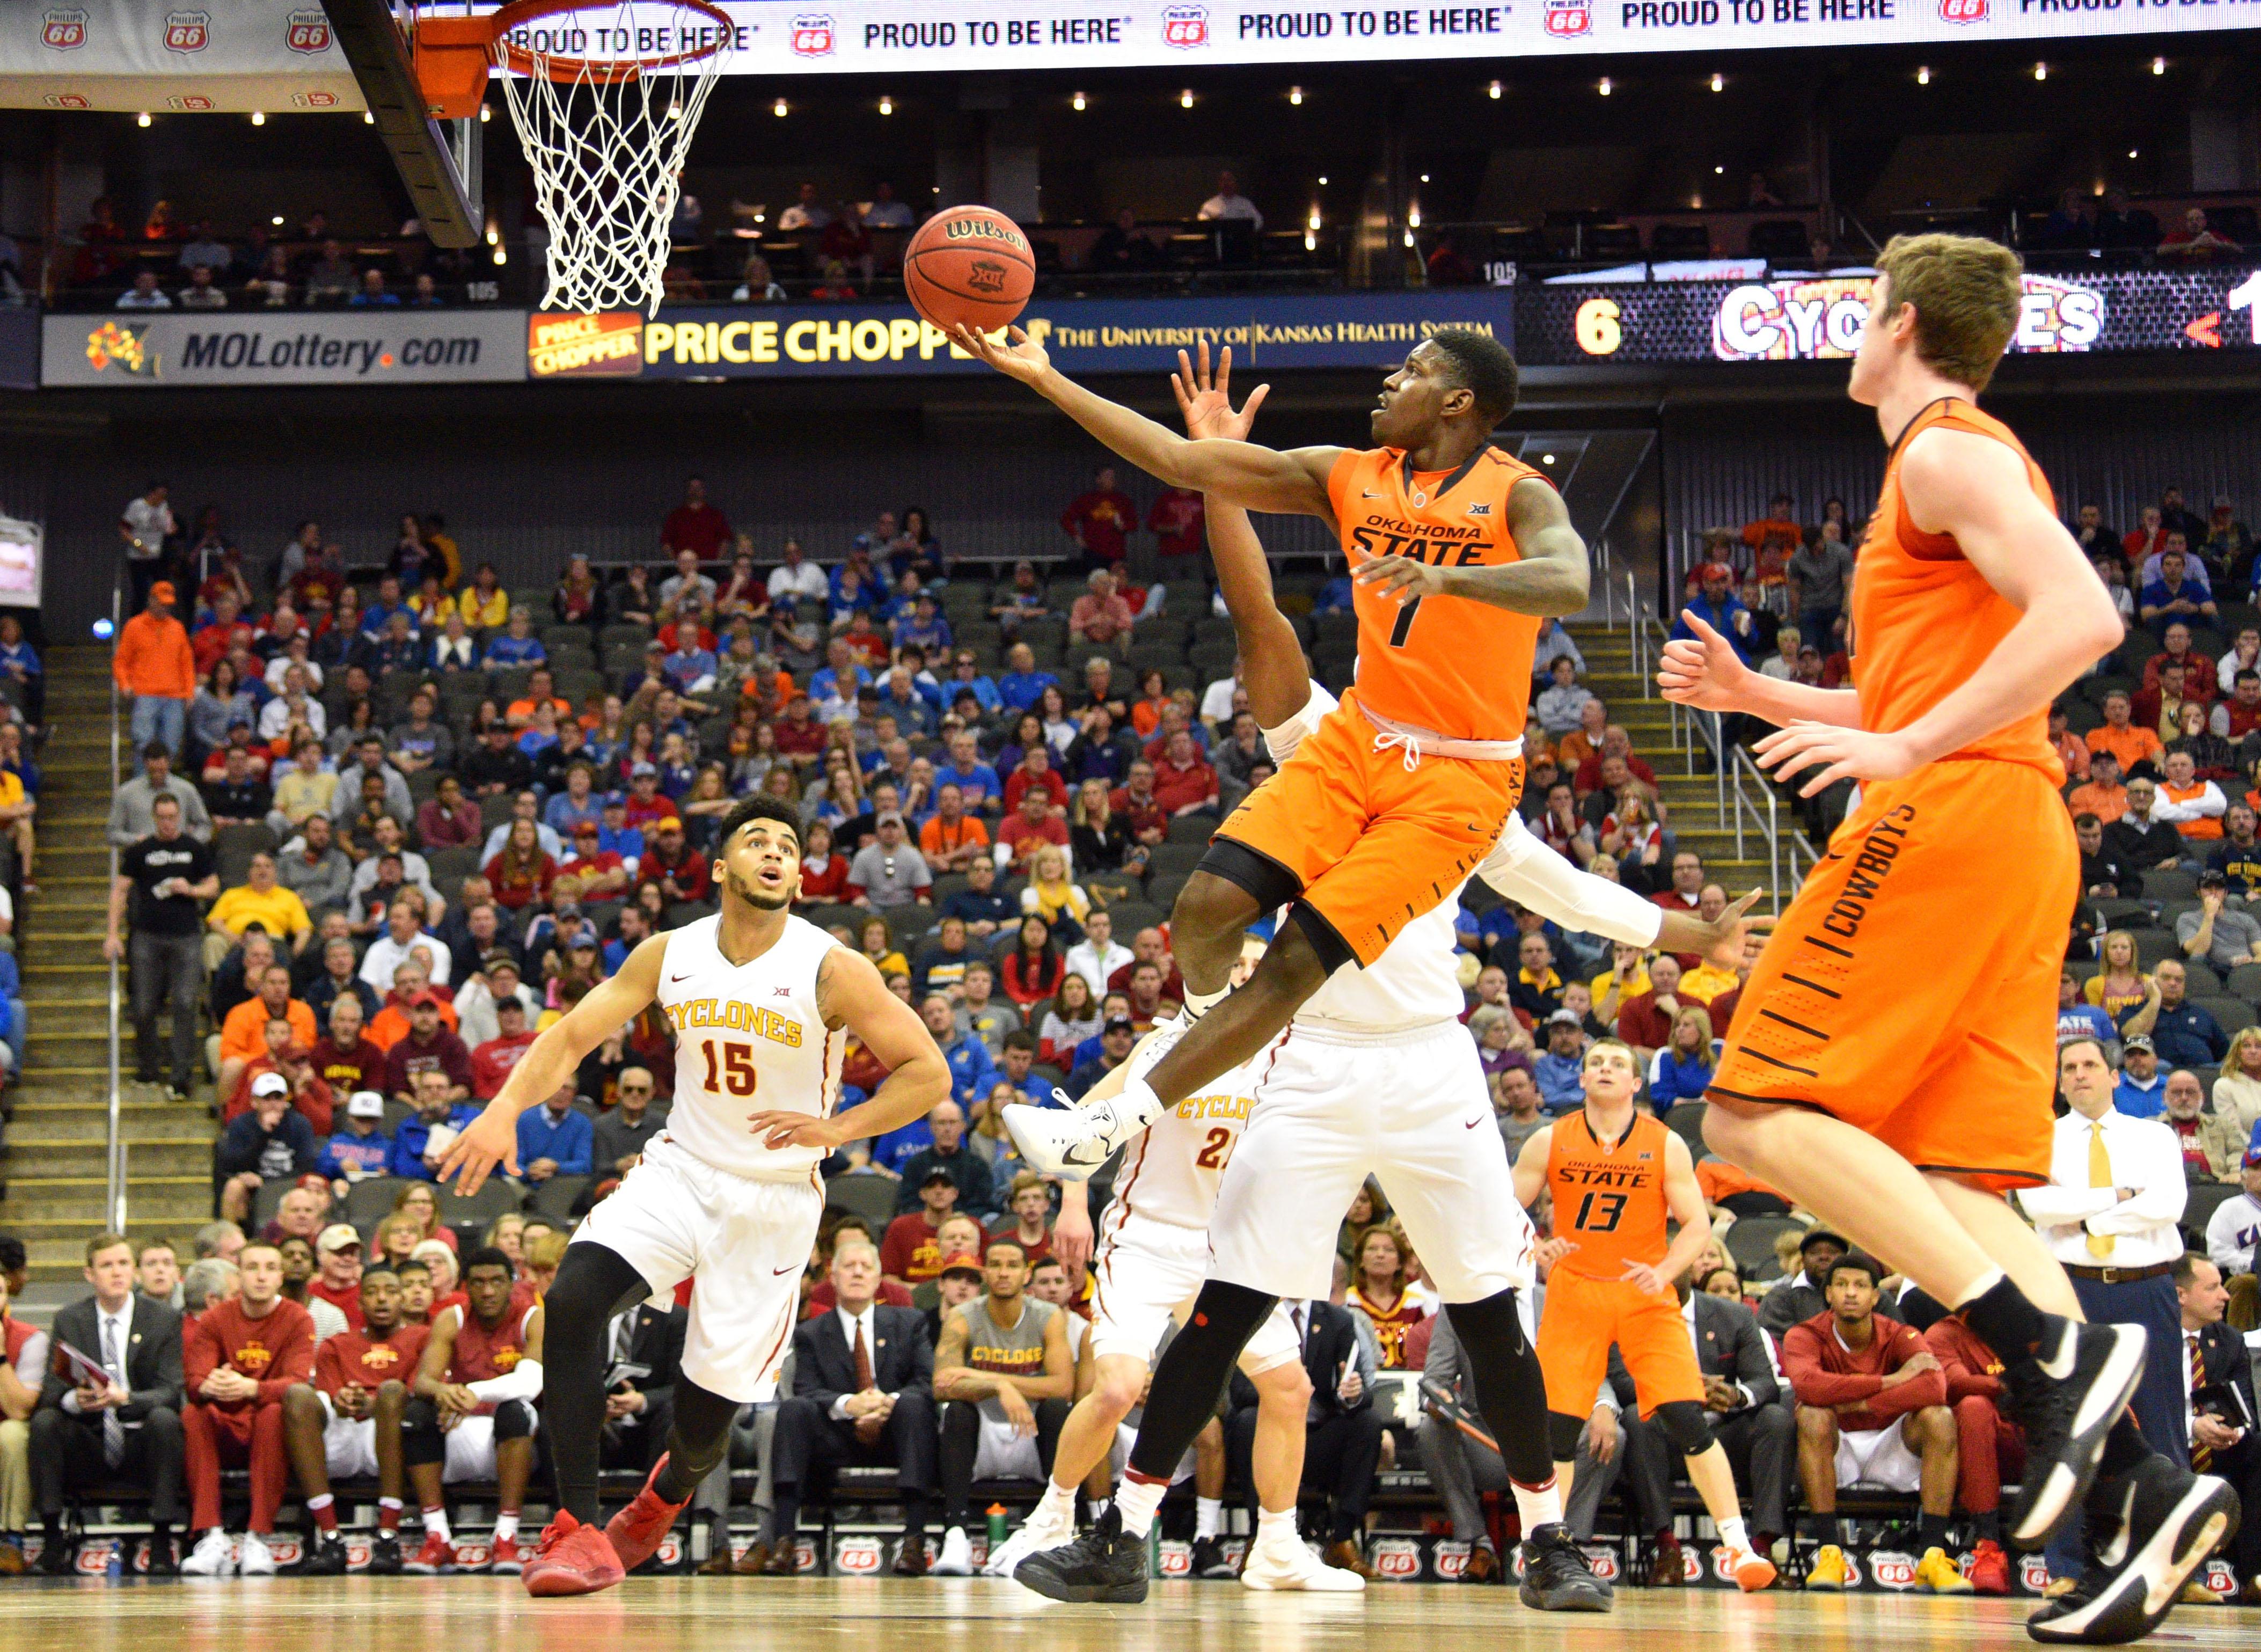 9927718-ncaa-basketball-big-12-championship-iowa-state-vs-oklahoma-state-1